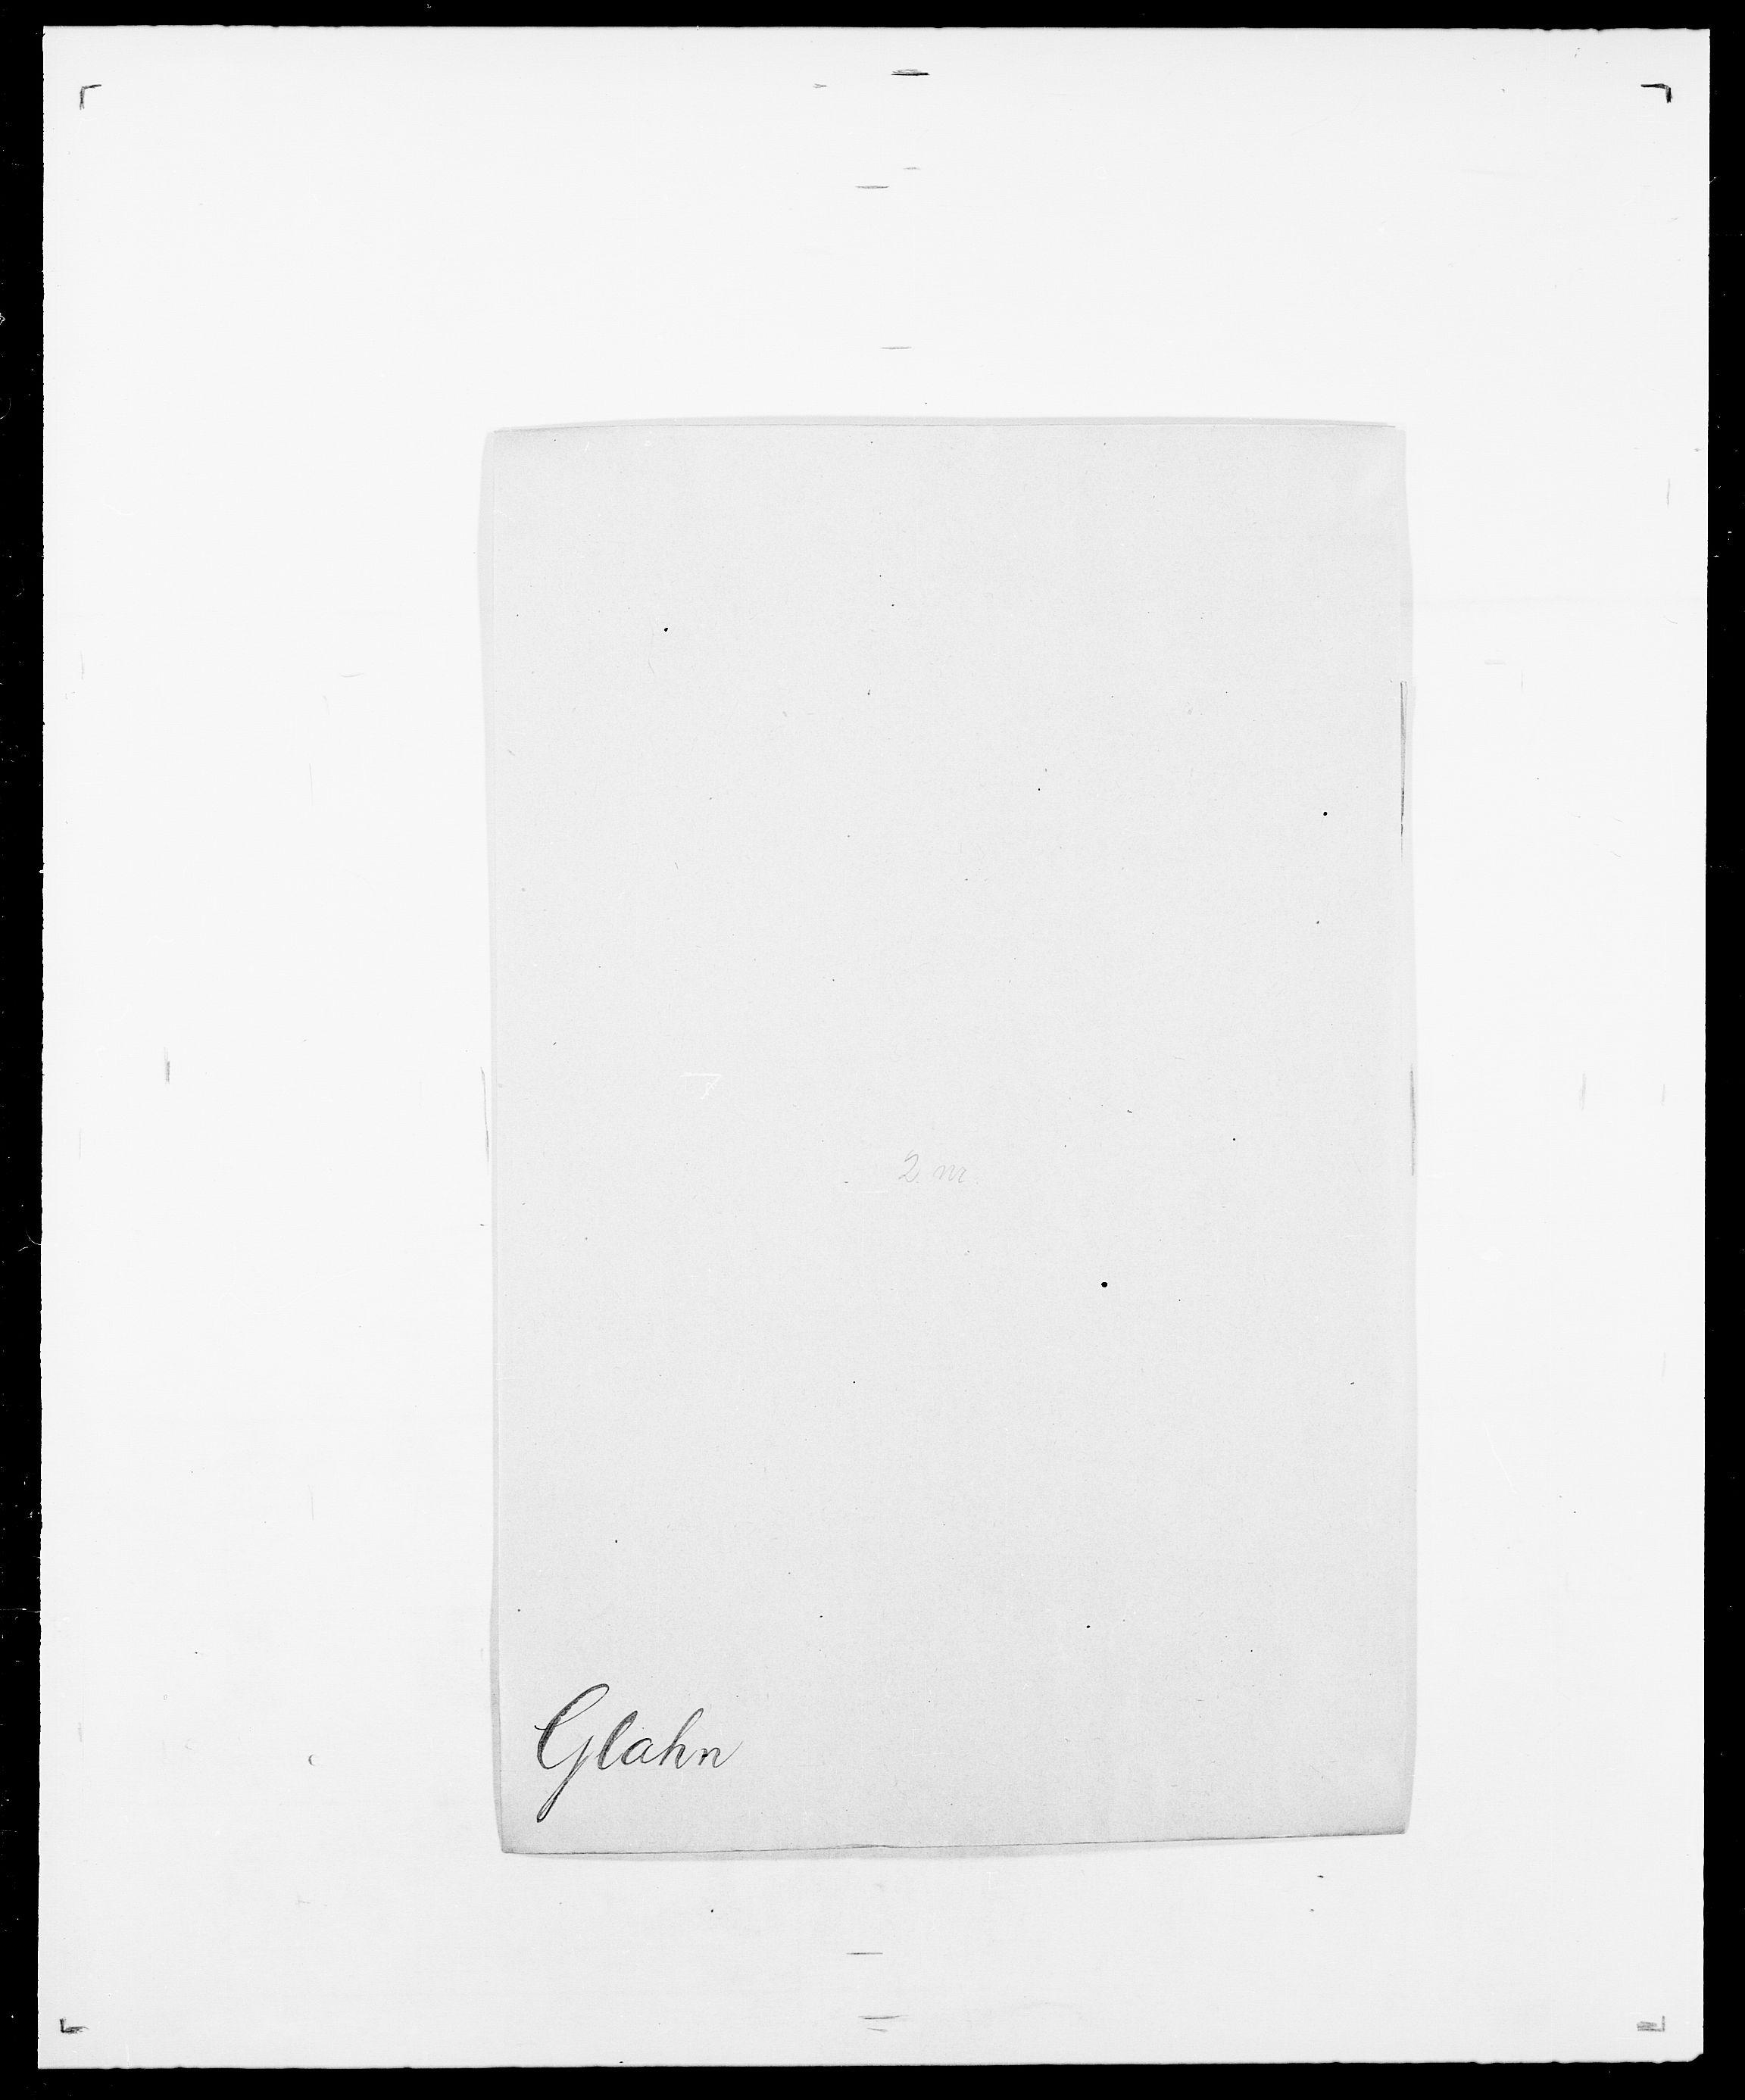 SAO, Delgobe, Charles Antoine - samling, D/Da/L0014: Giebdhausen - Grip, s. 271